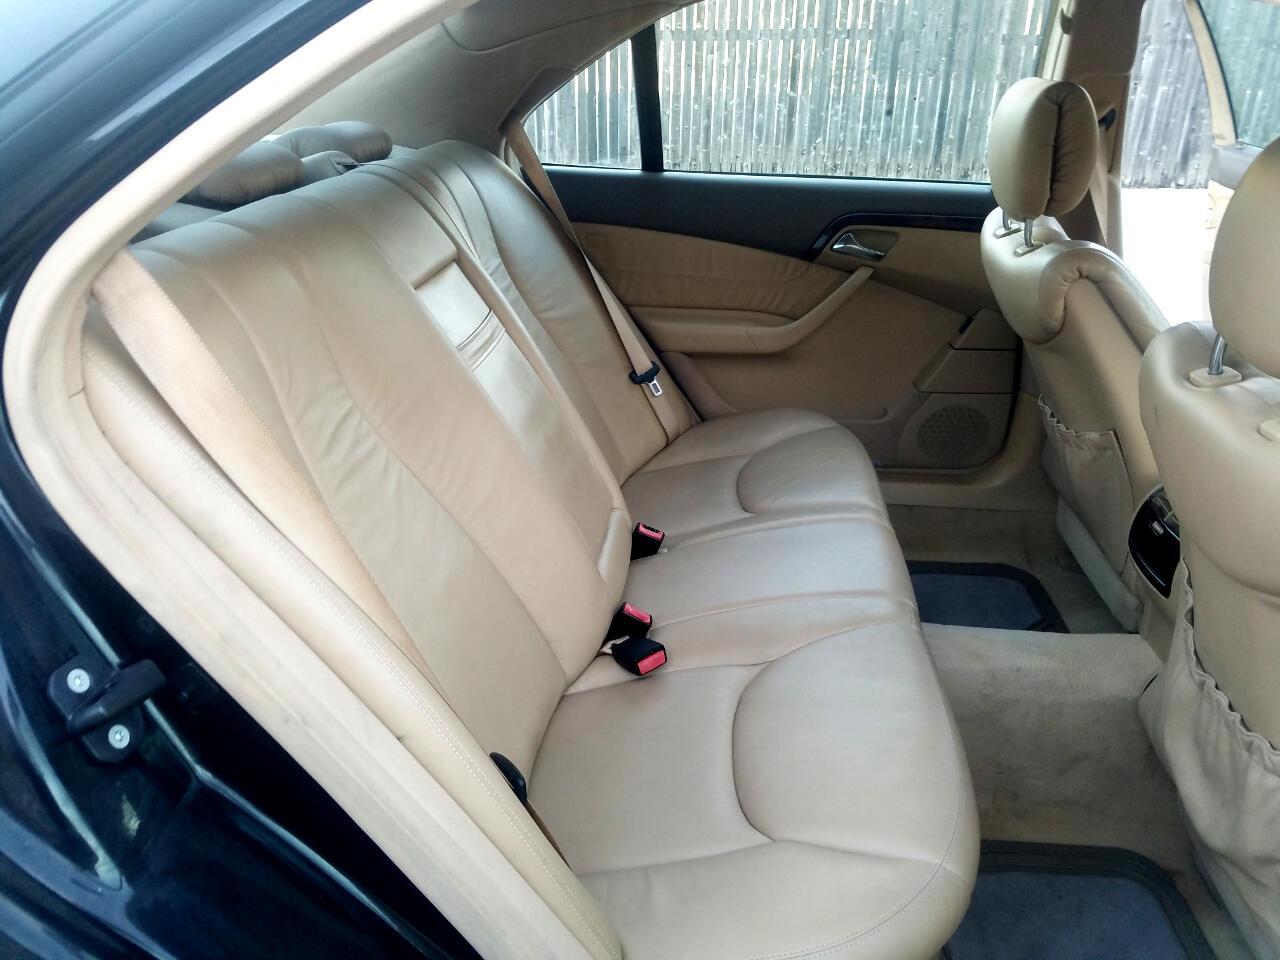 2000 Mercedes-Benz S-Class 4dr Sdn 5.0L